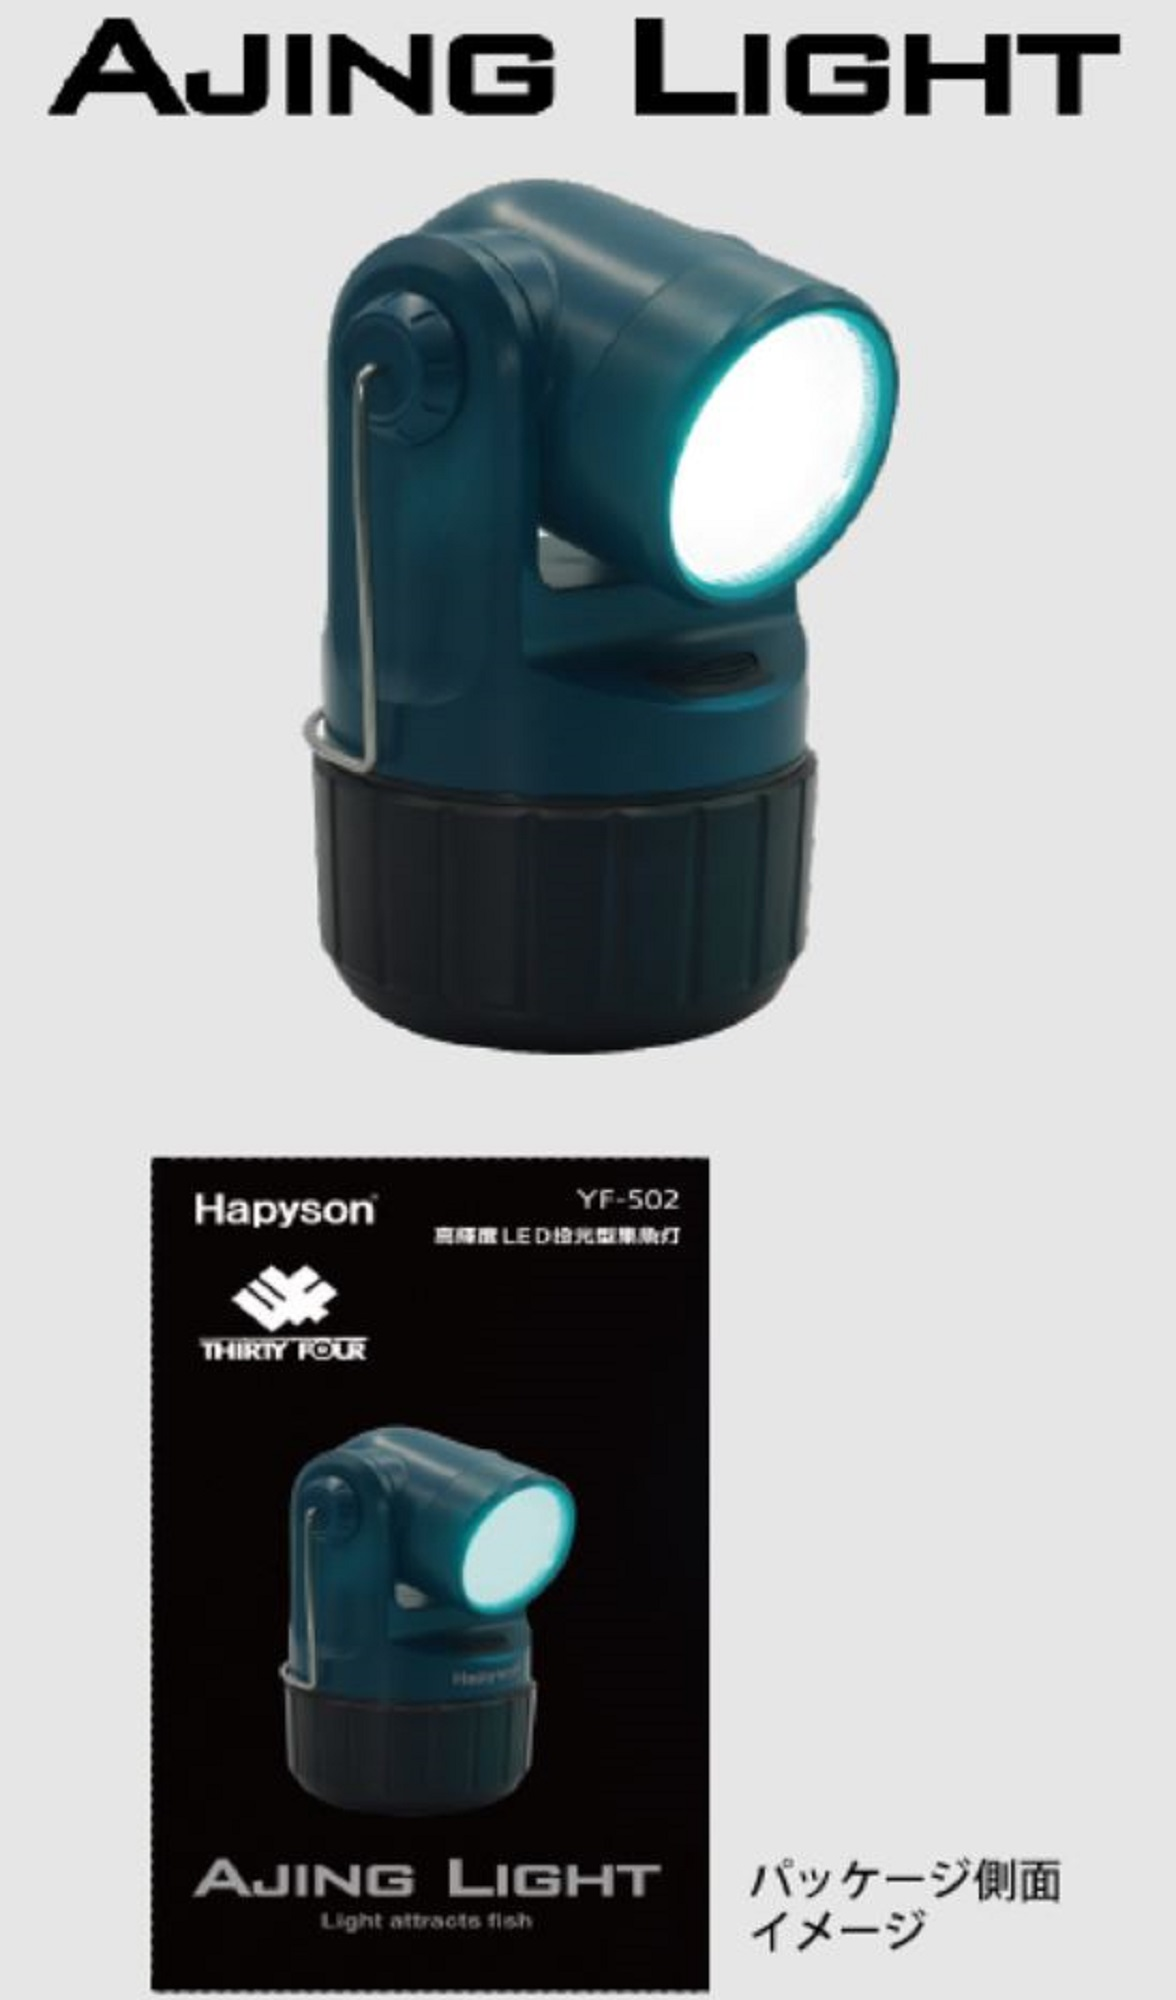 Hapyson YF-502 LED Fishing Light Ajing 125 x 130 x 200 mm 1.3kg (3529)